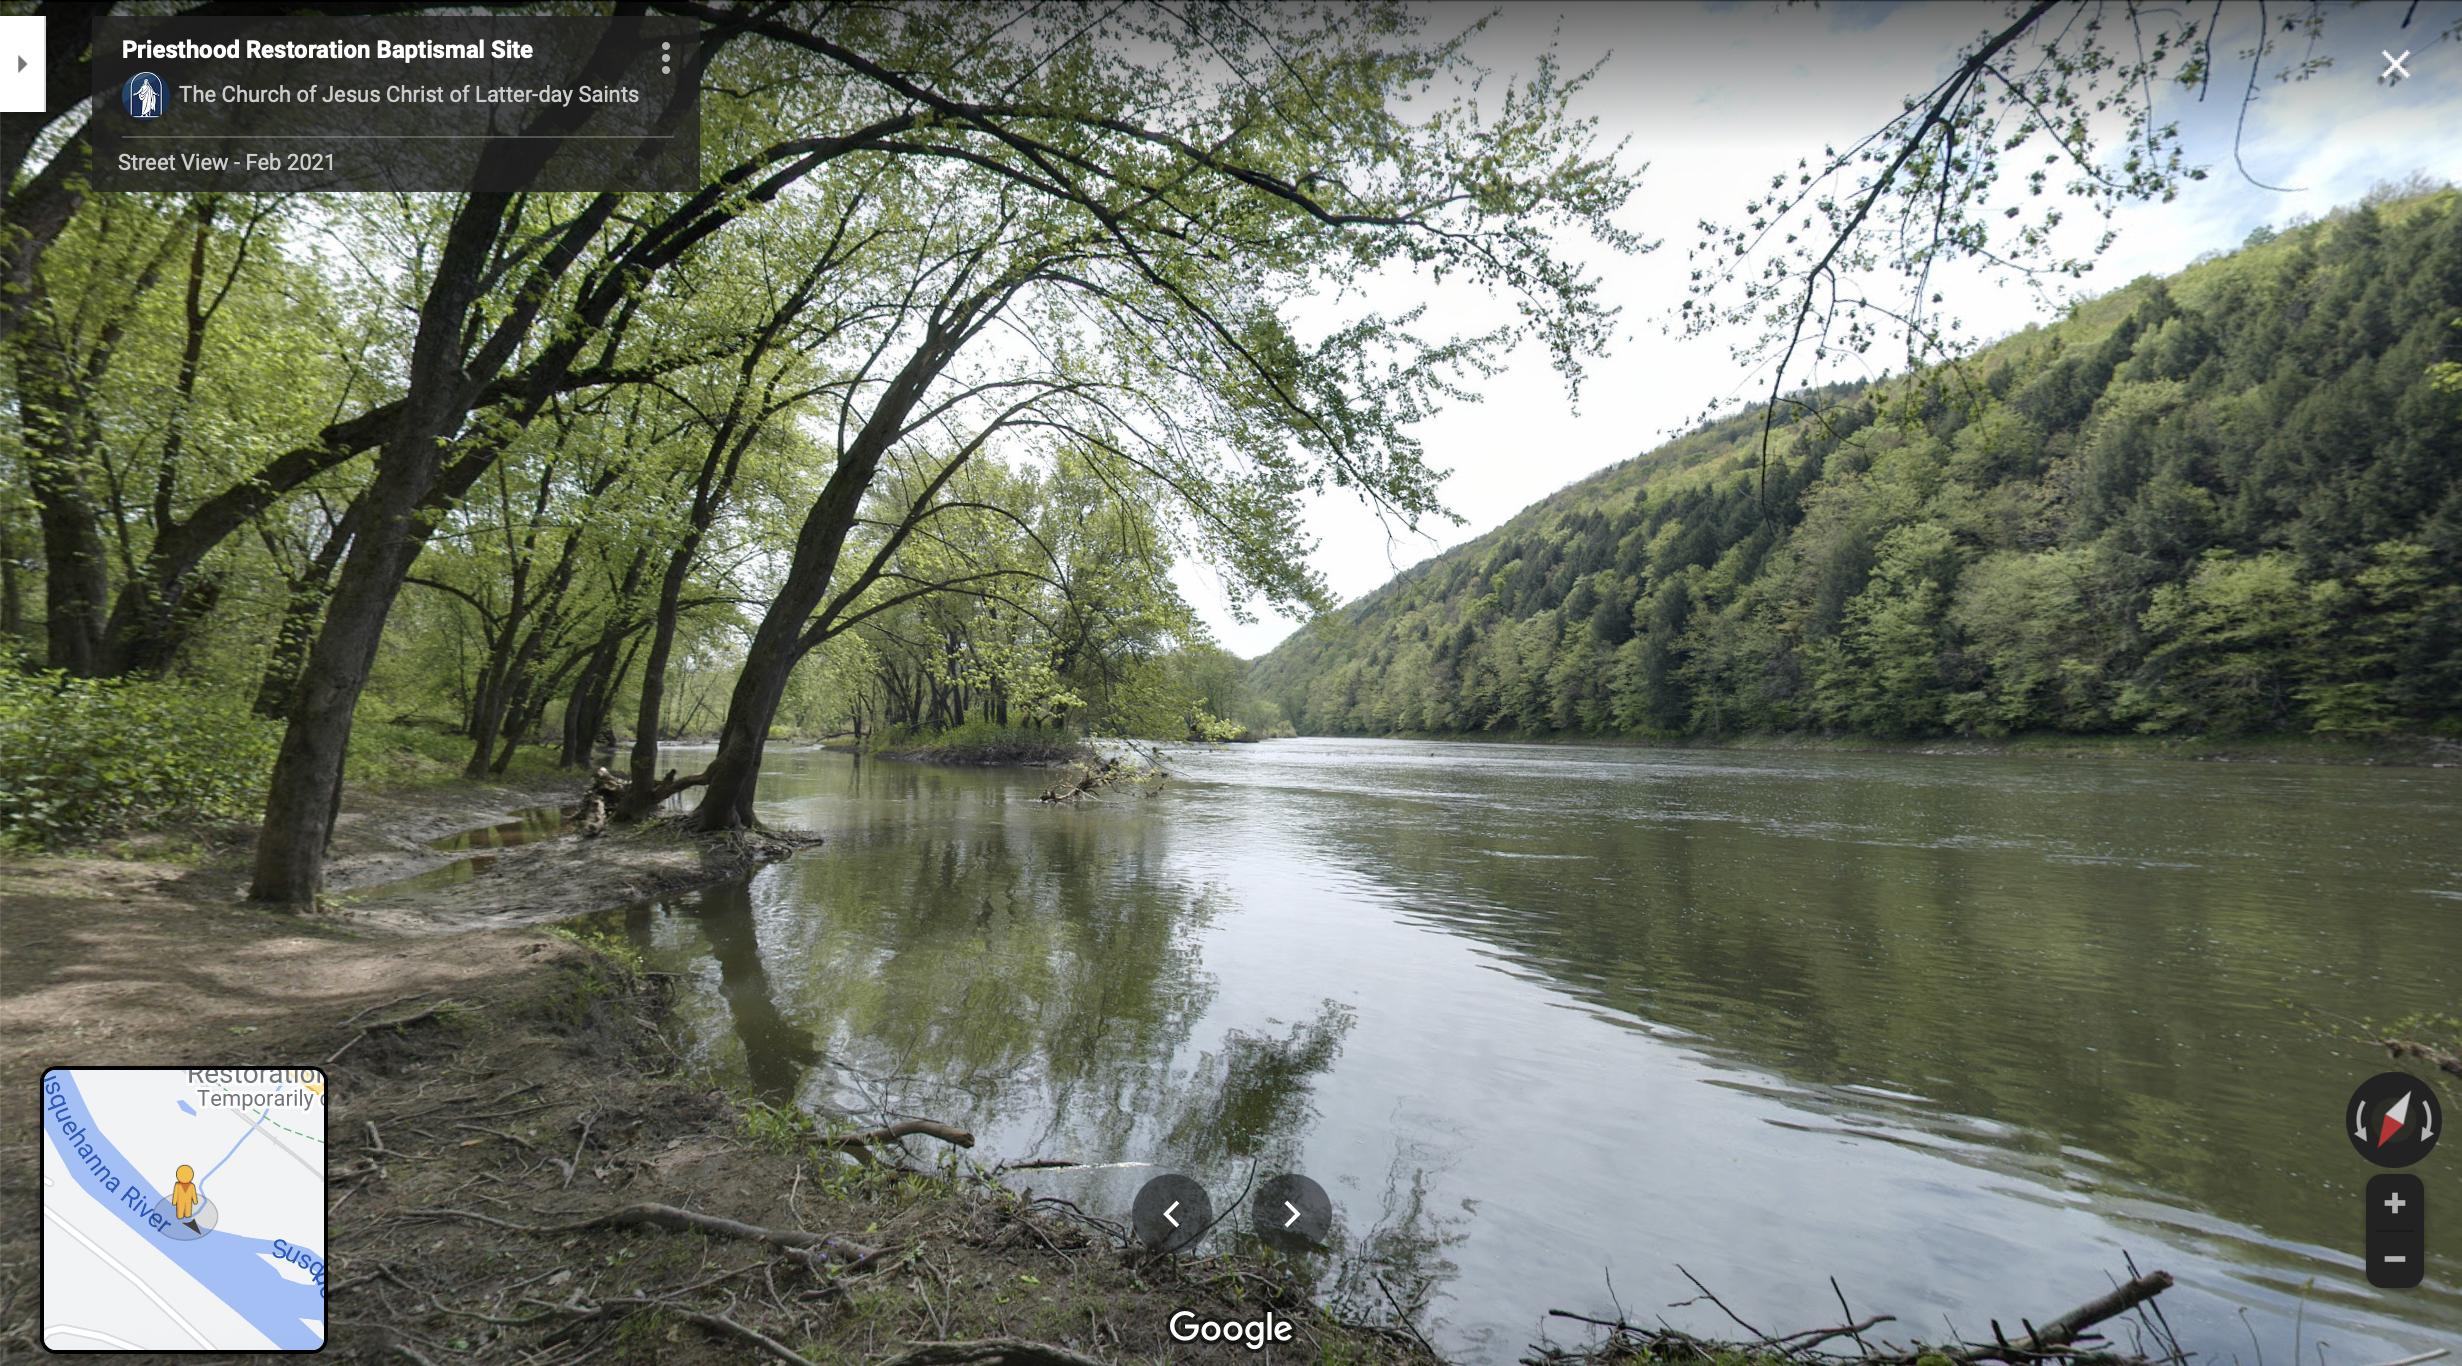 Screenshot of the Google Maps 360 view of Susquehanna River